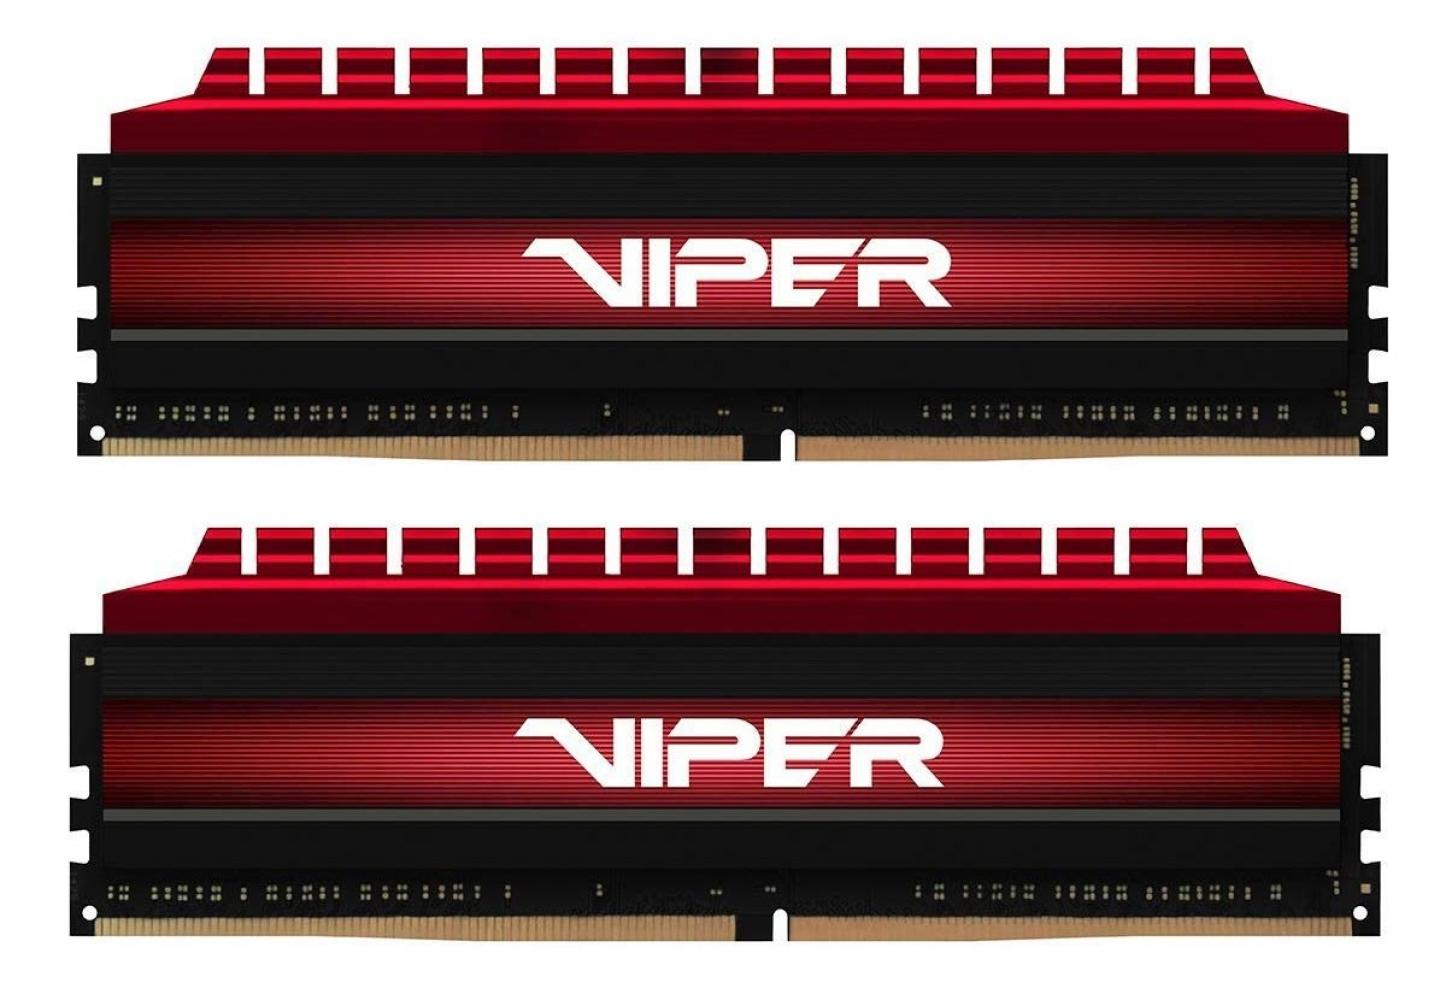 Оперативная память набор Patriot Viper 4 2x4GB DDR4 PC4-24000 (PV48G300C6K)